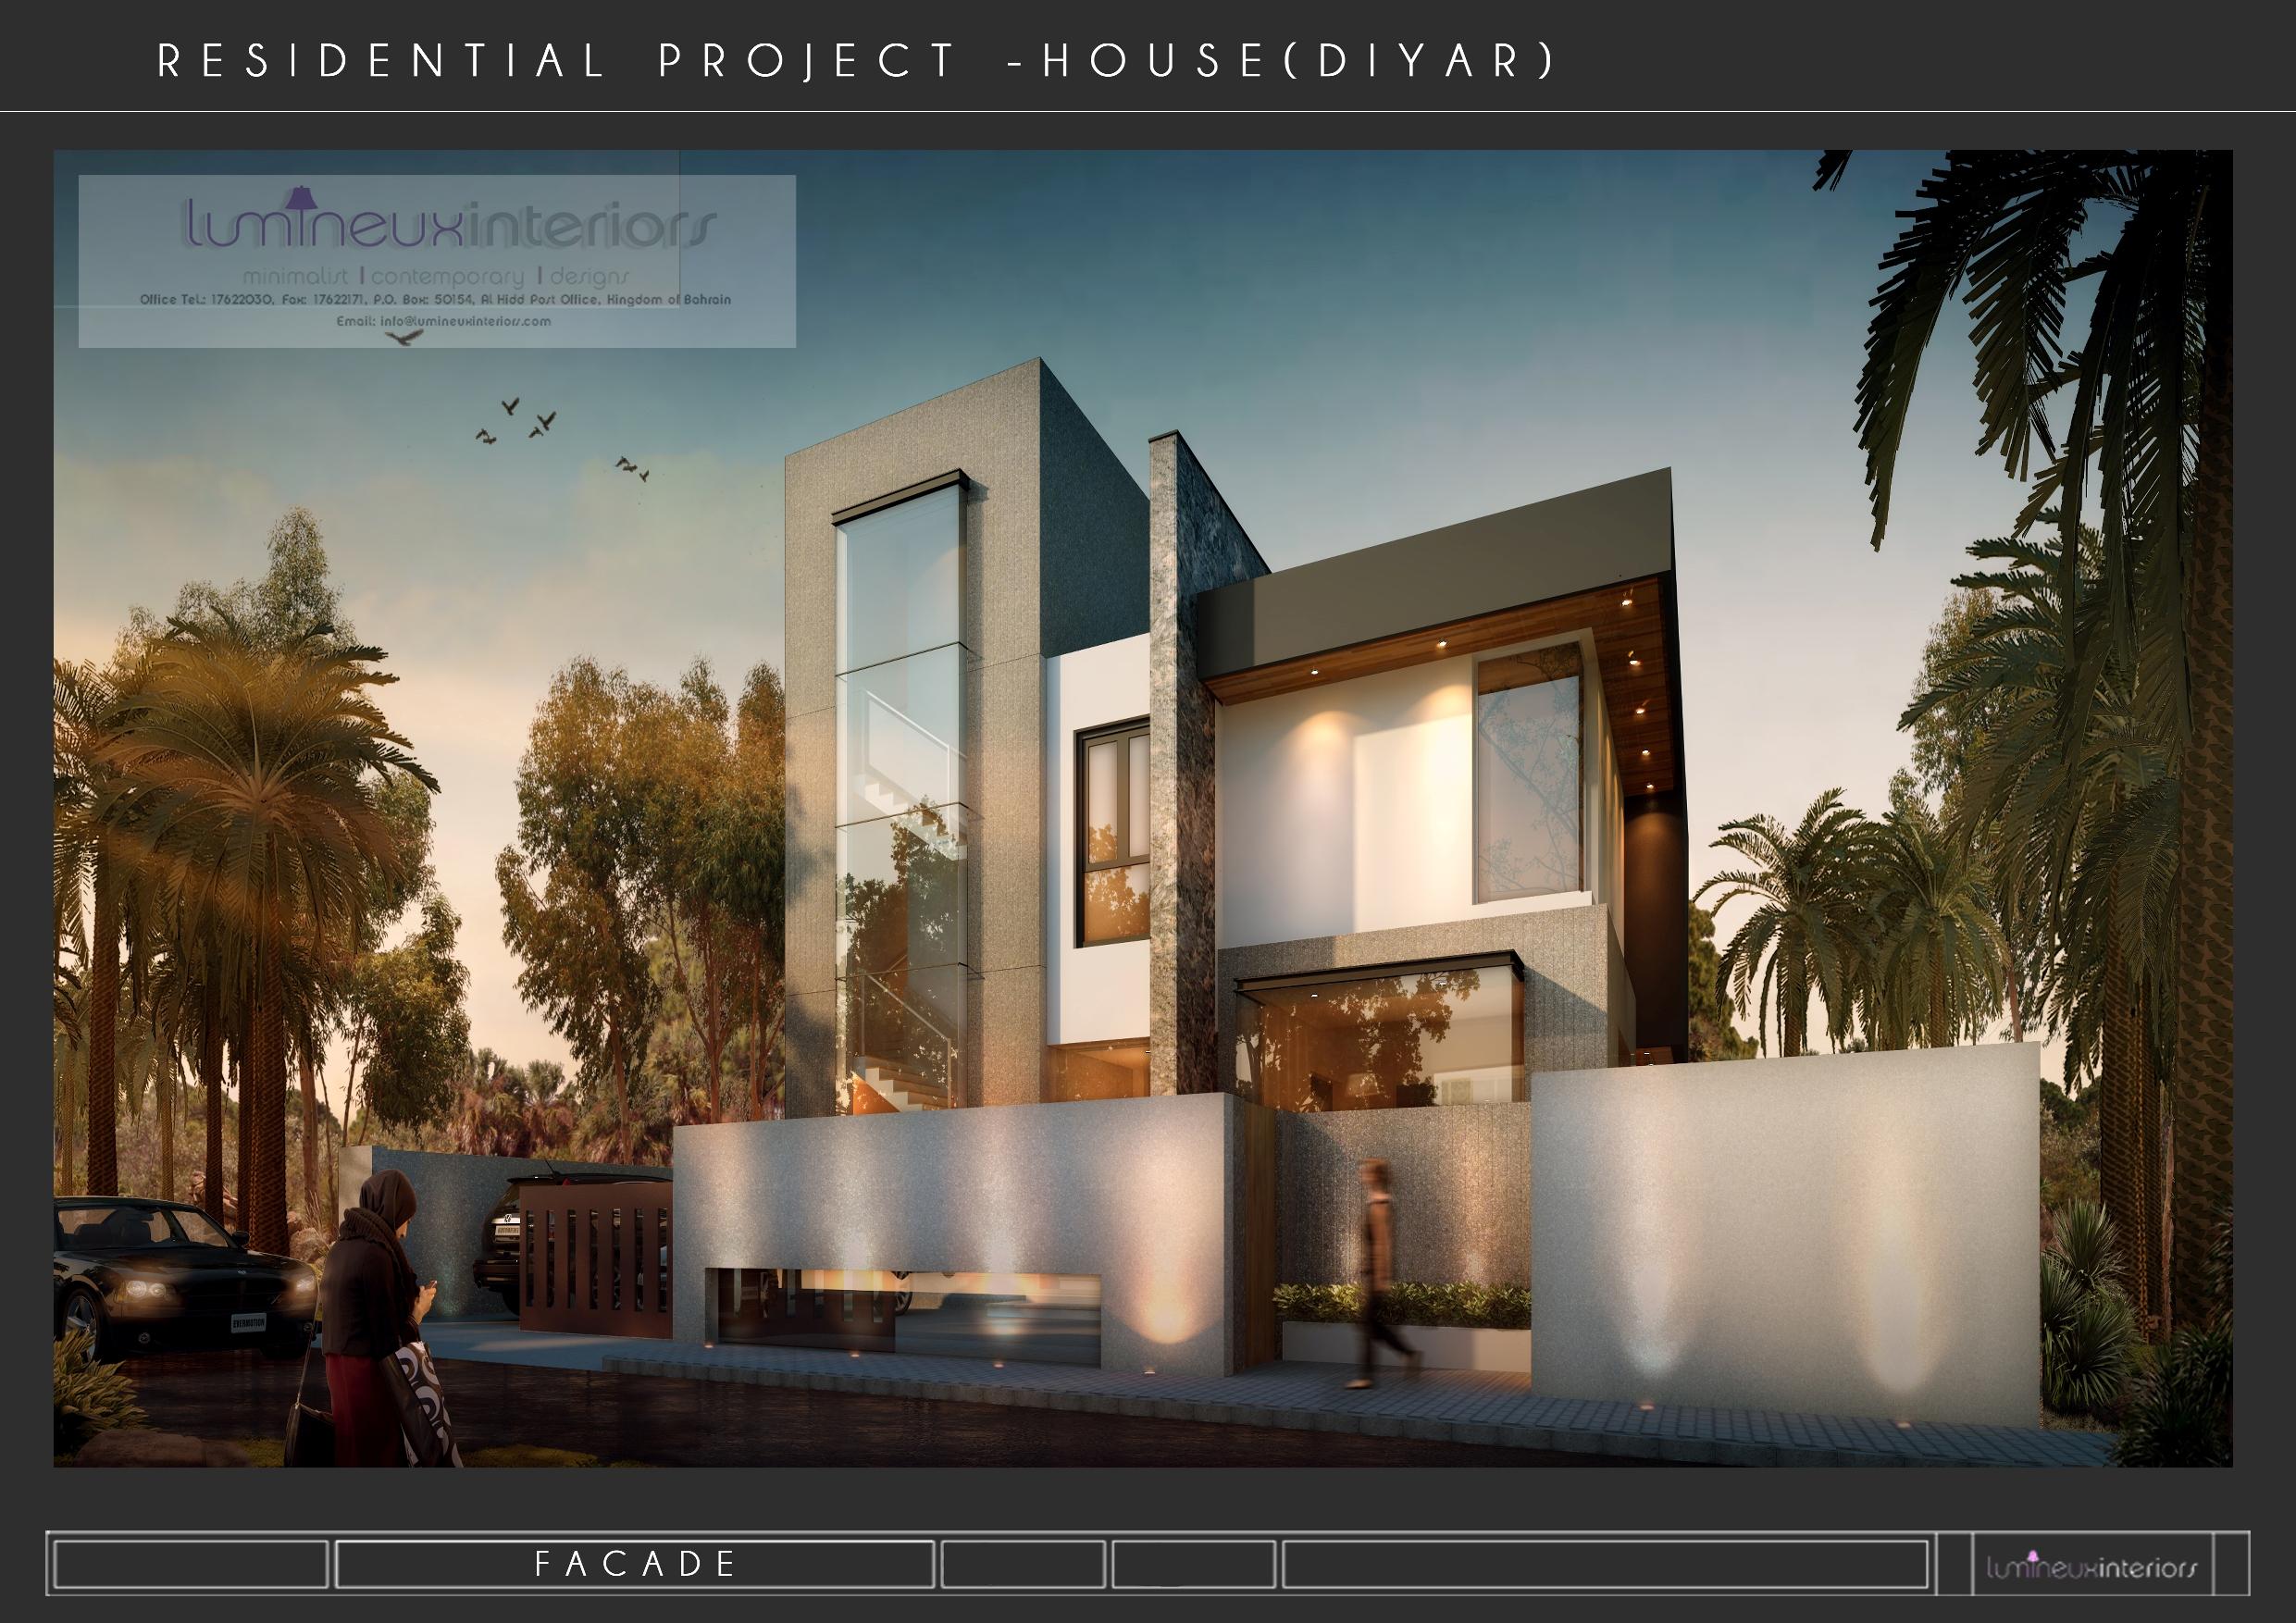 House (DIYAR)